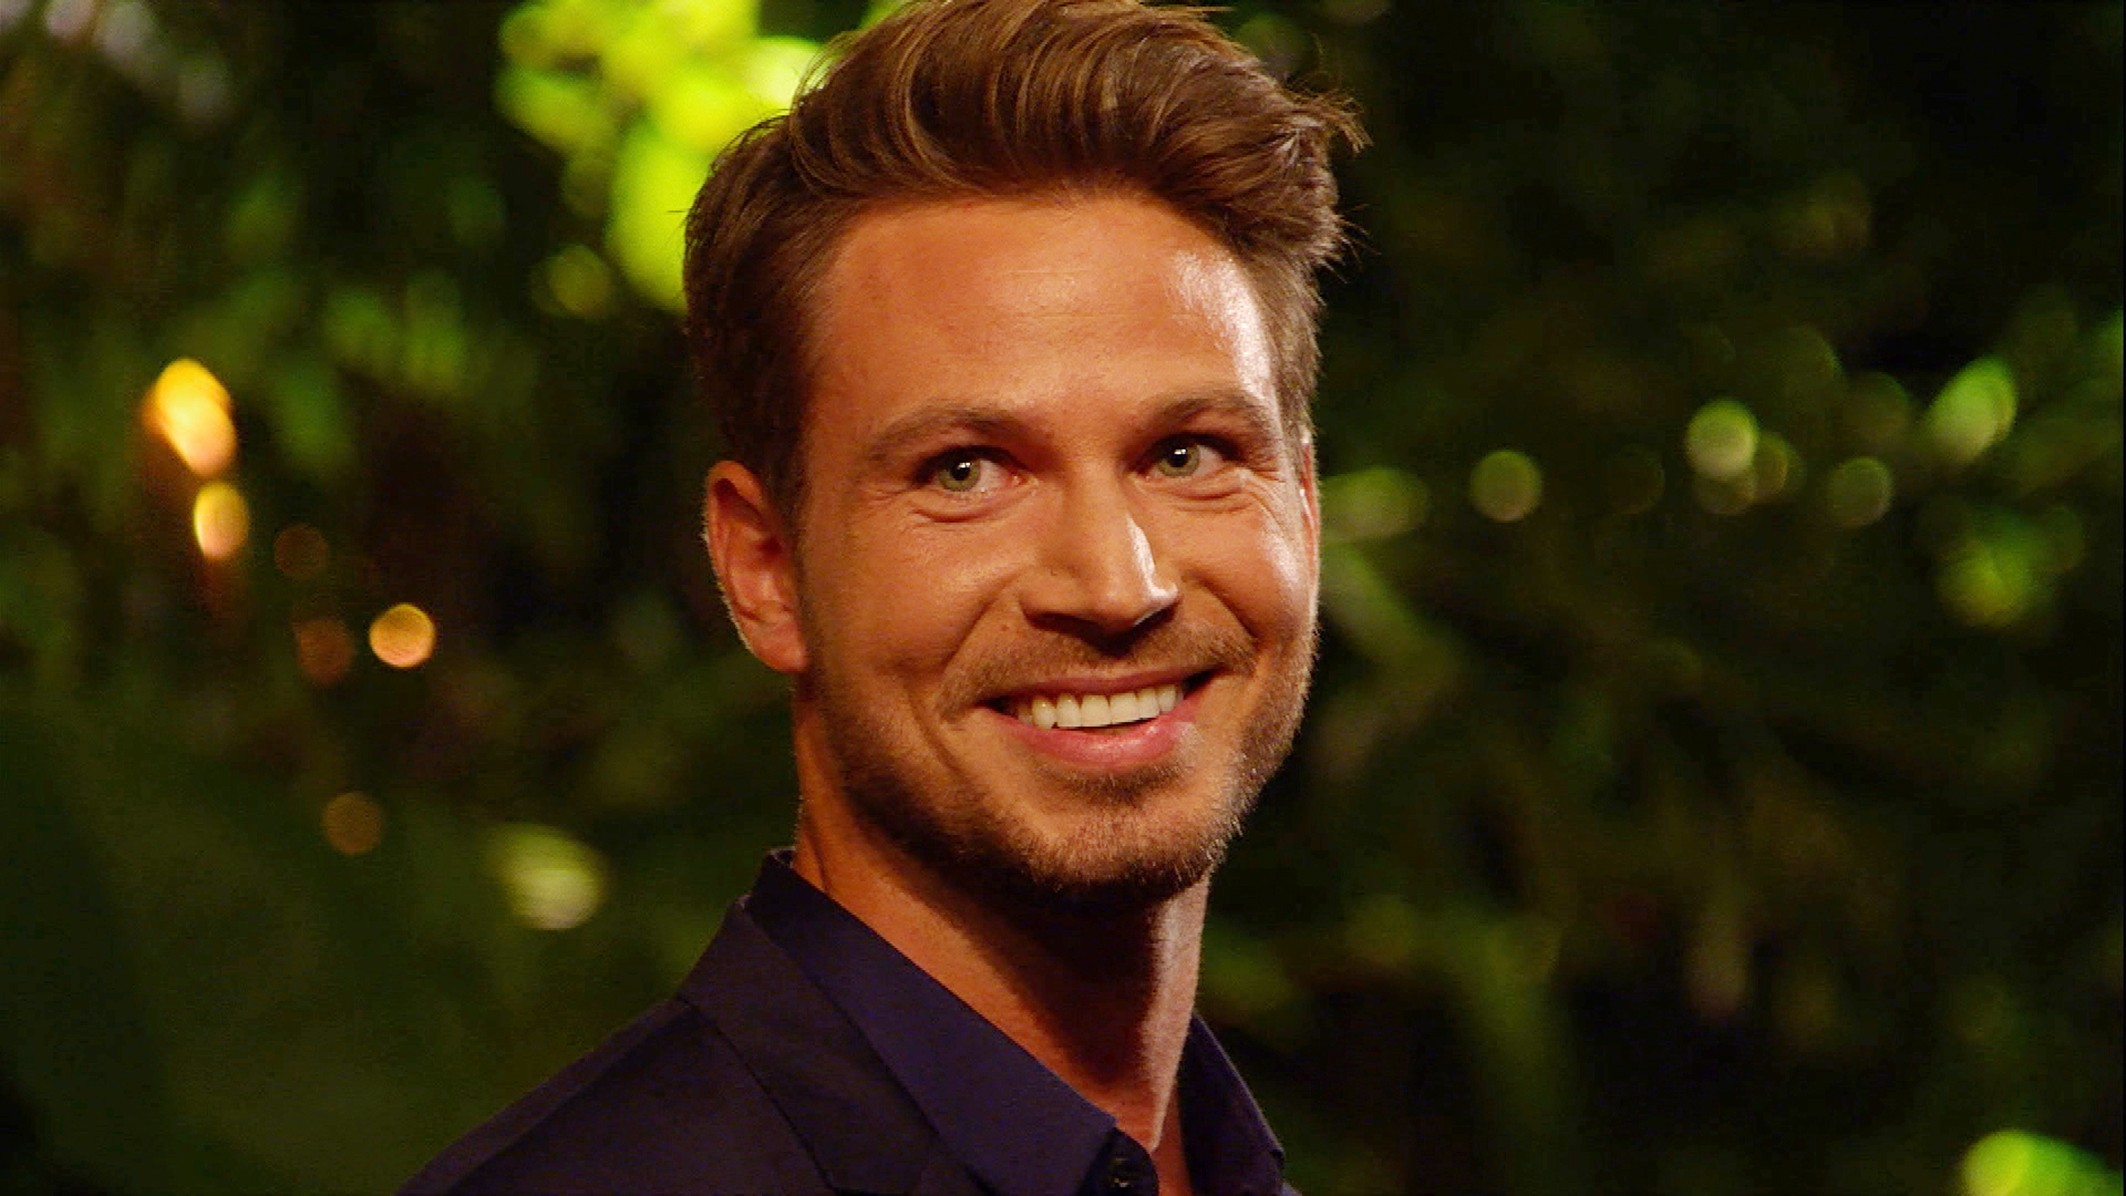 Sebastian freut sich auf die 22 Ladys. Alle Infos zu 'Der Bachelor' im Special bei RTL.de: http://www.rtl.de/cms/sendungen/show/der-bachelor.html